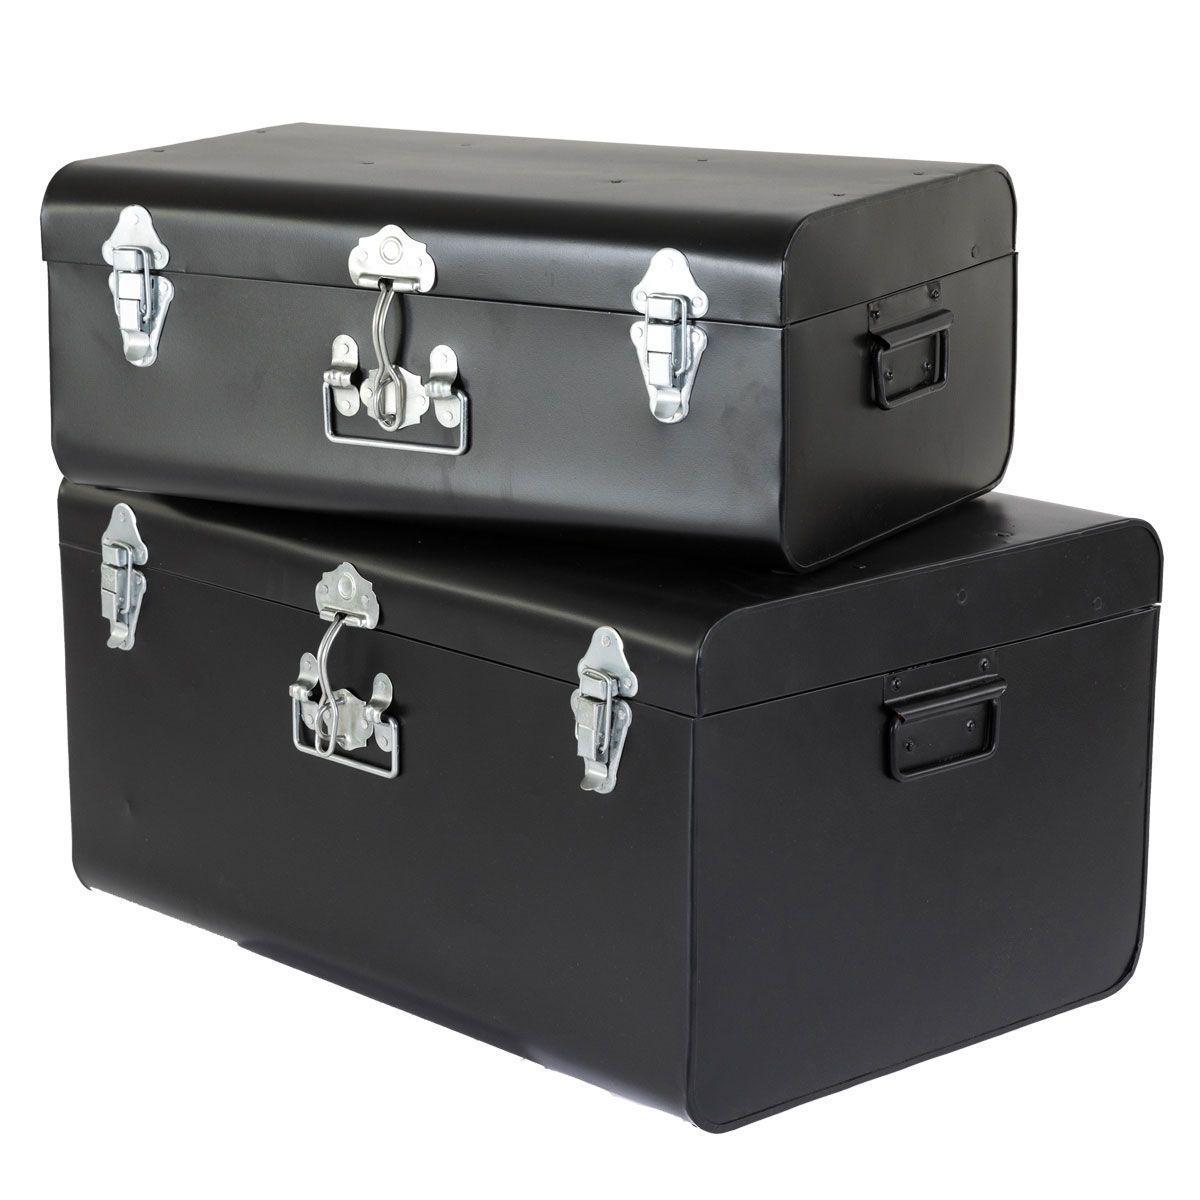 malles en acier brut trunck lot de 2 noir. Black Bedroom Furniture Sets. Home Design Ideas